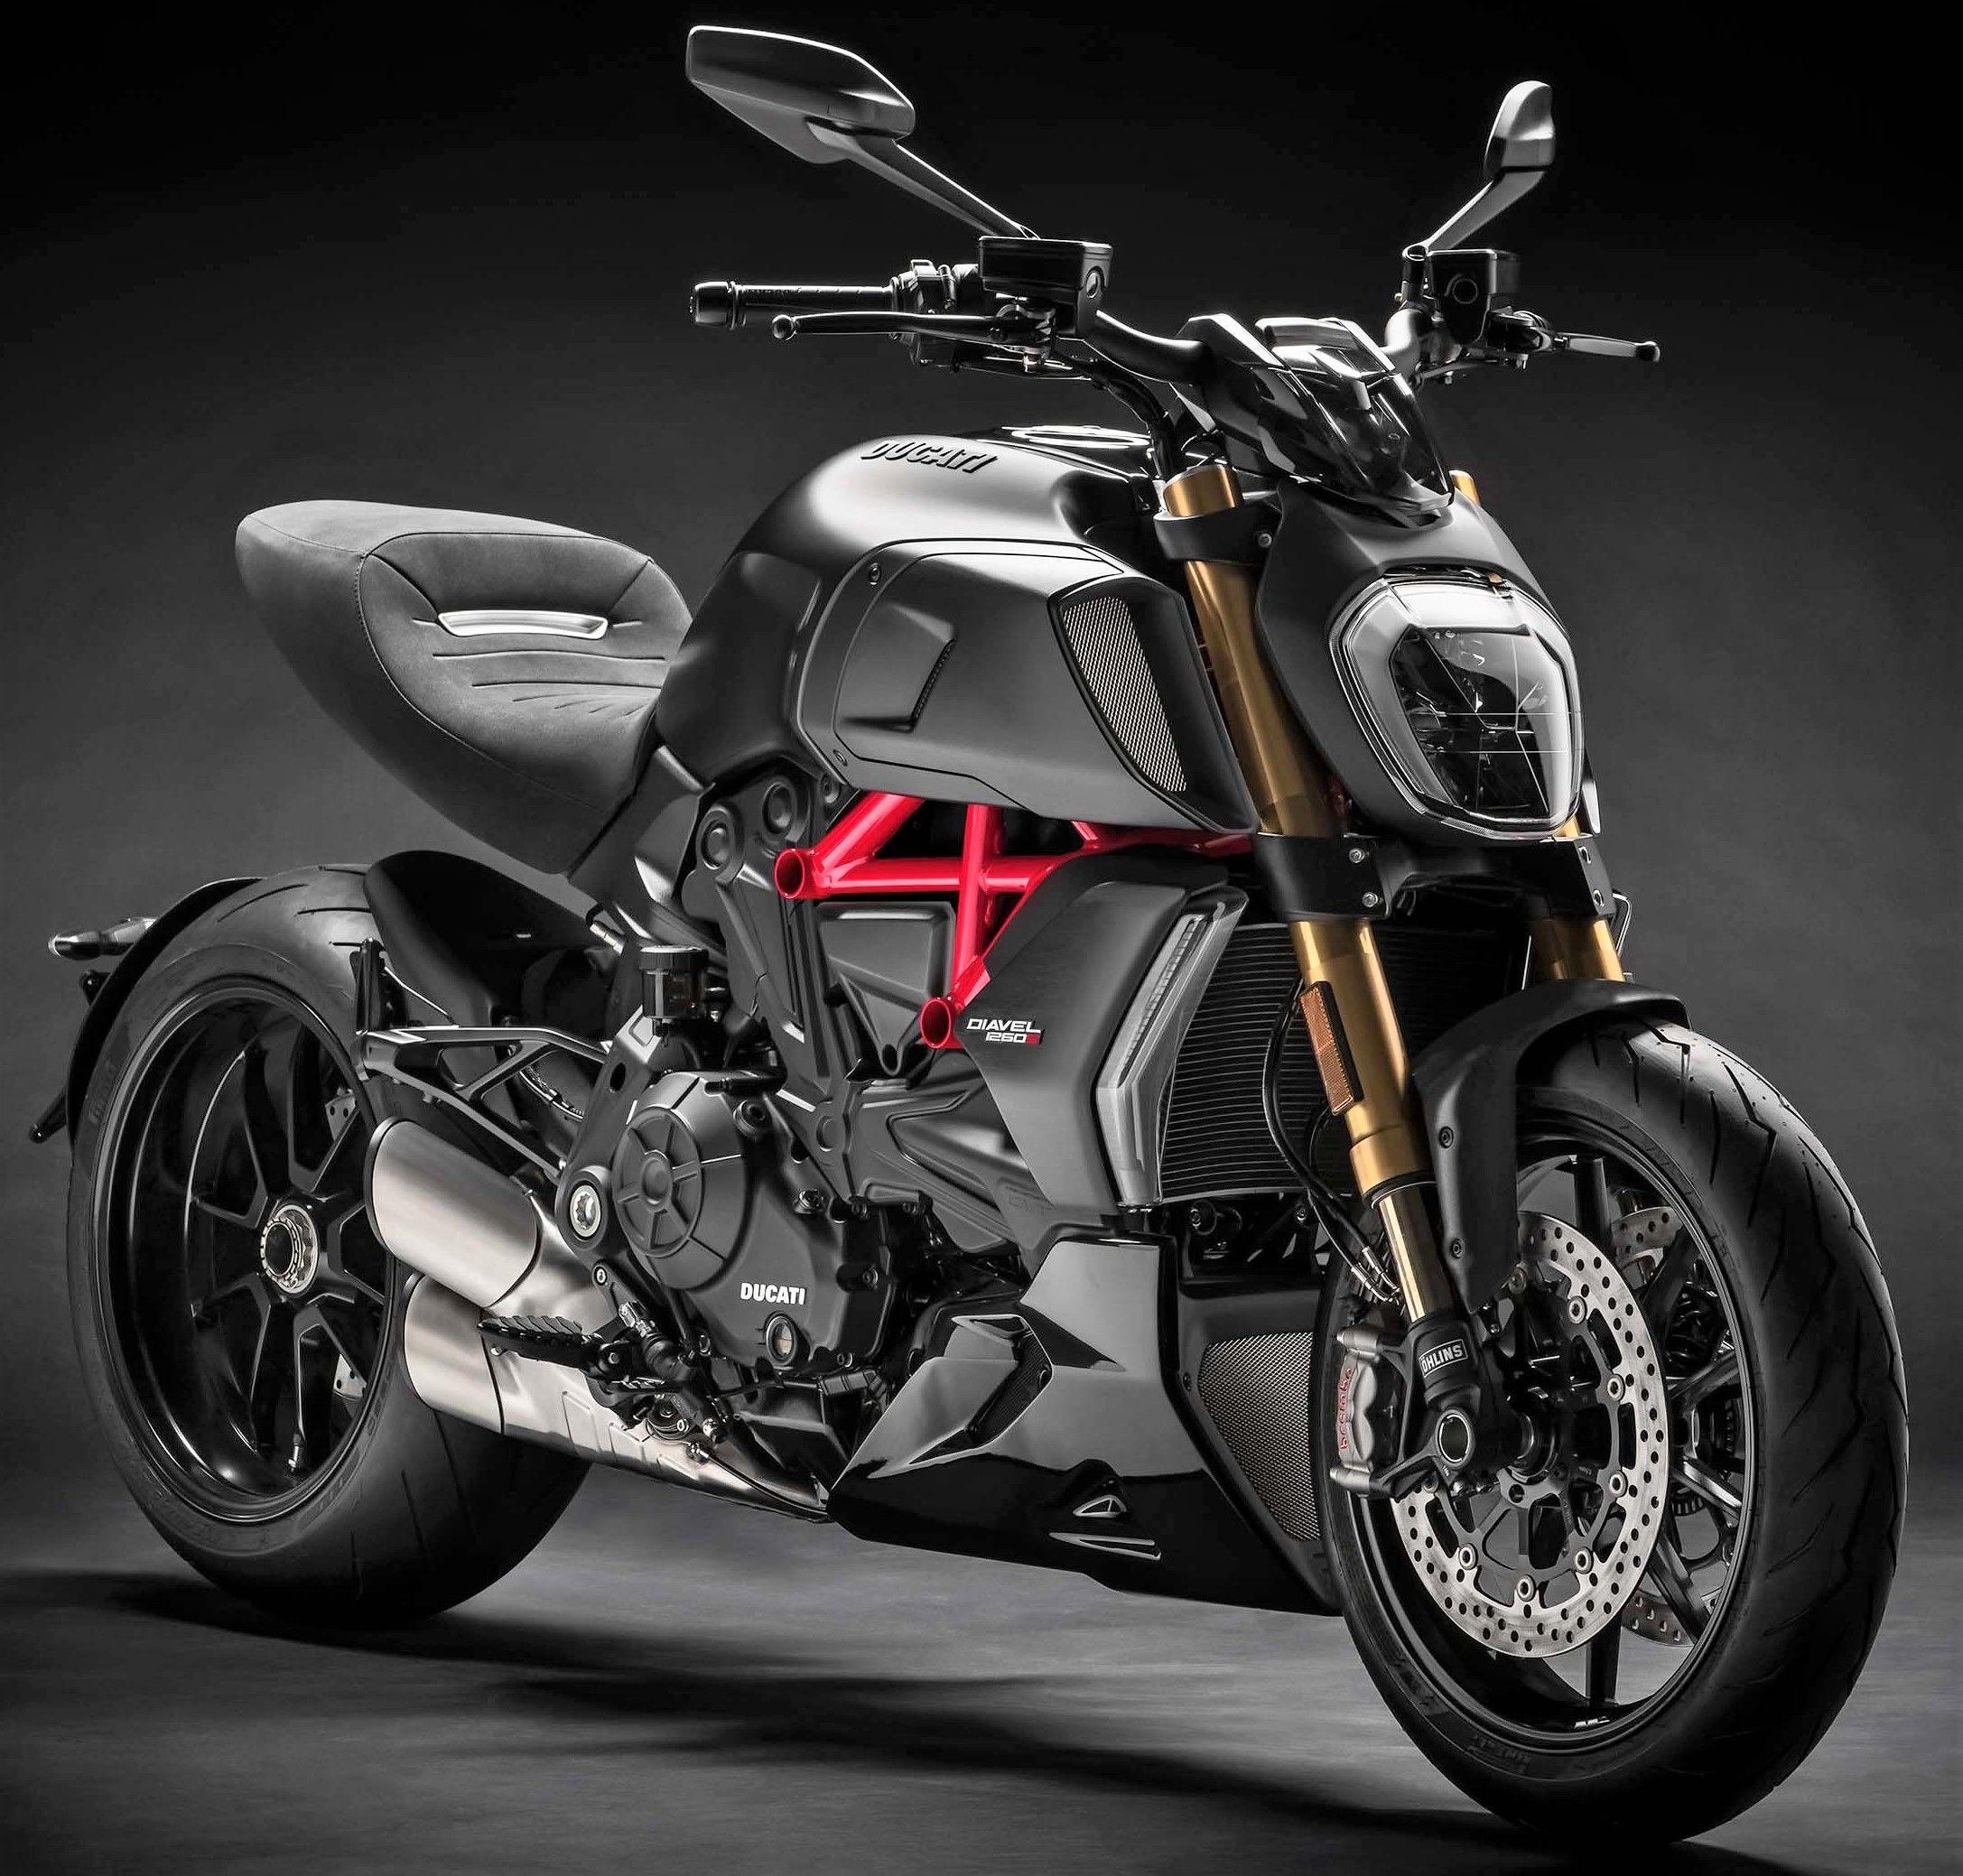 EICMA 2018: Ducati Diavel 1260 Cruiser | Ducati diavel, New